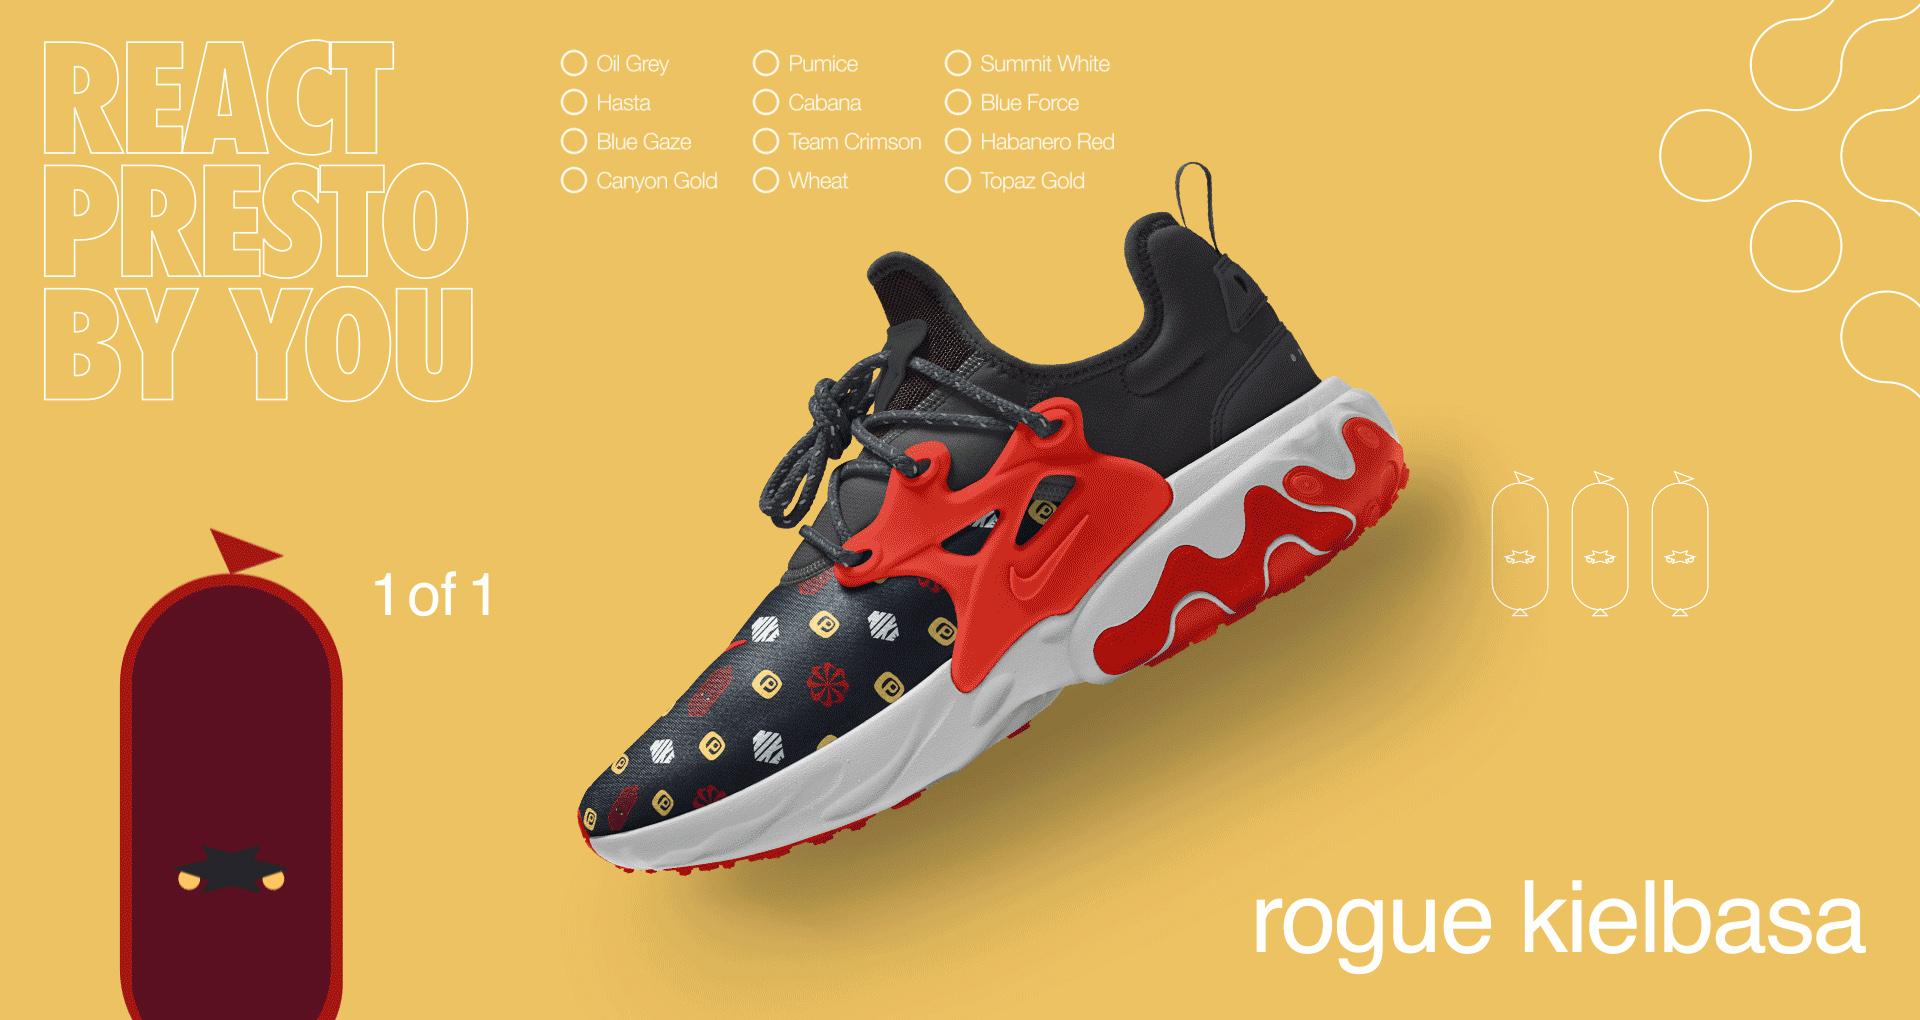 Riego lamentar Centrar  Nike-React-Presto-NIKEiD-Rogue-Kielbasa - WearTesters